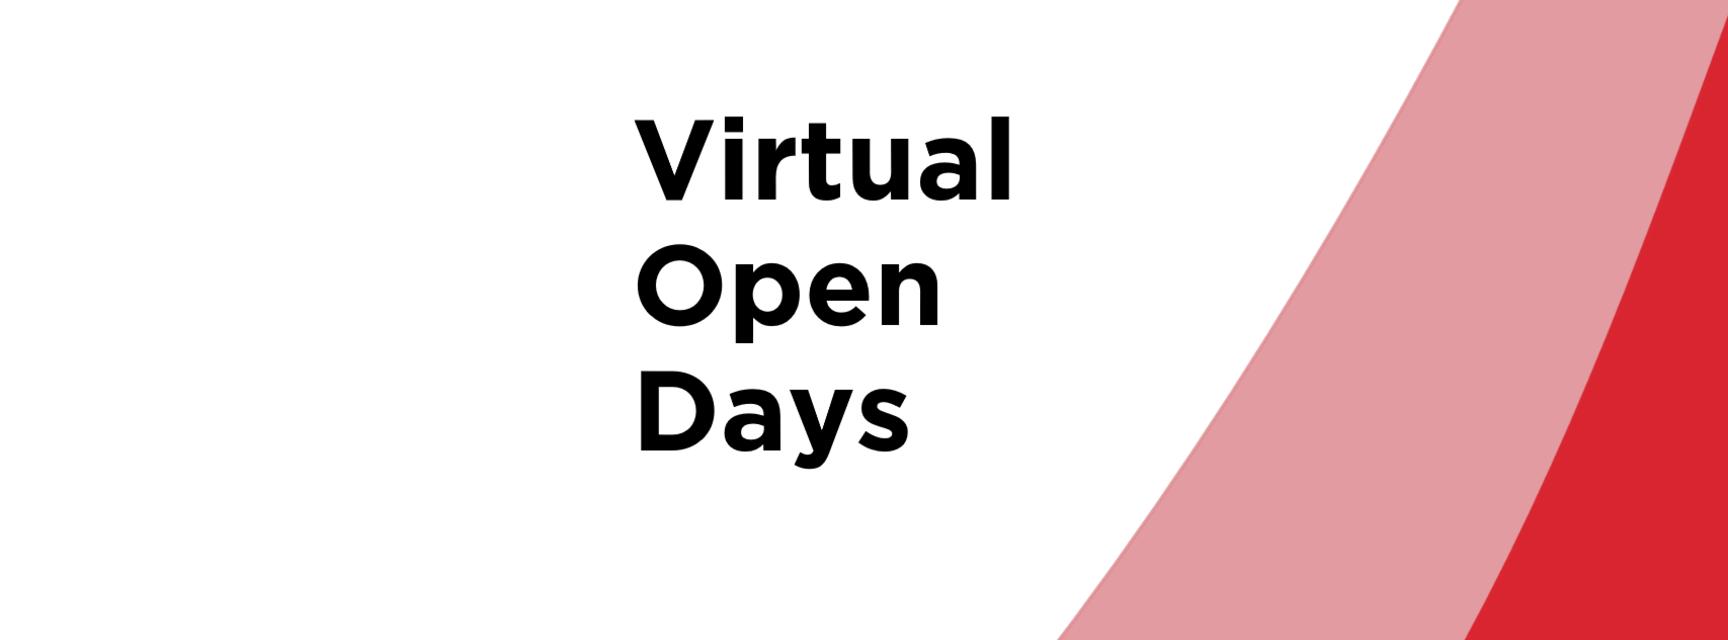 virtual open days small